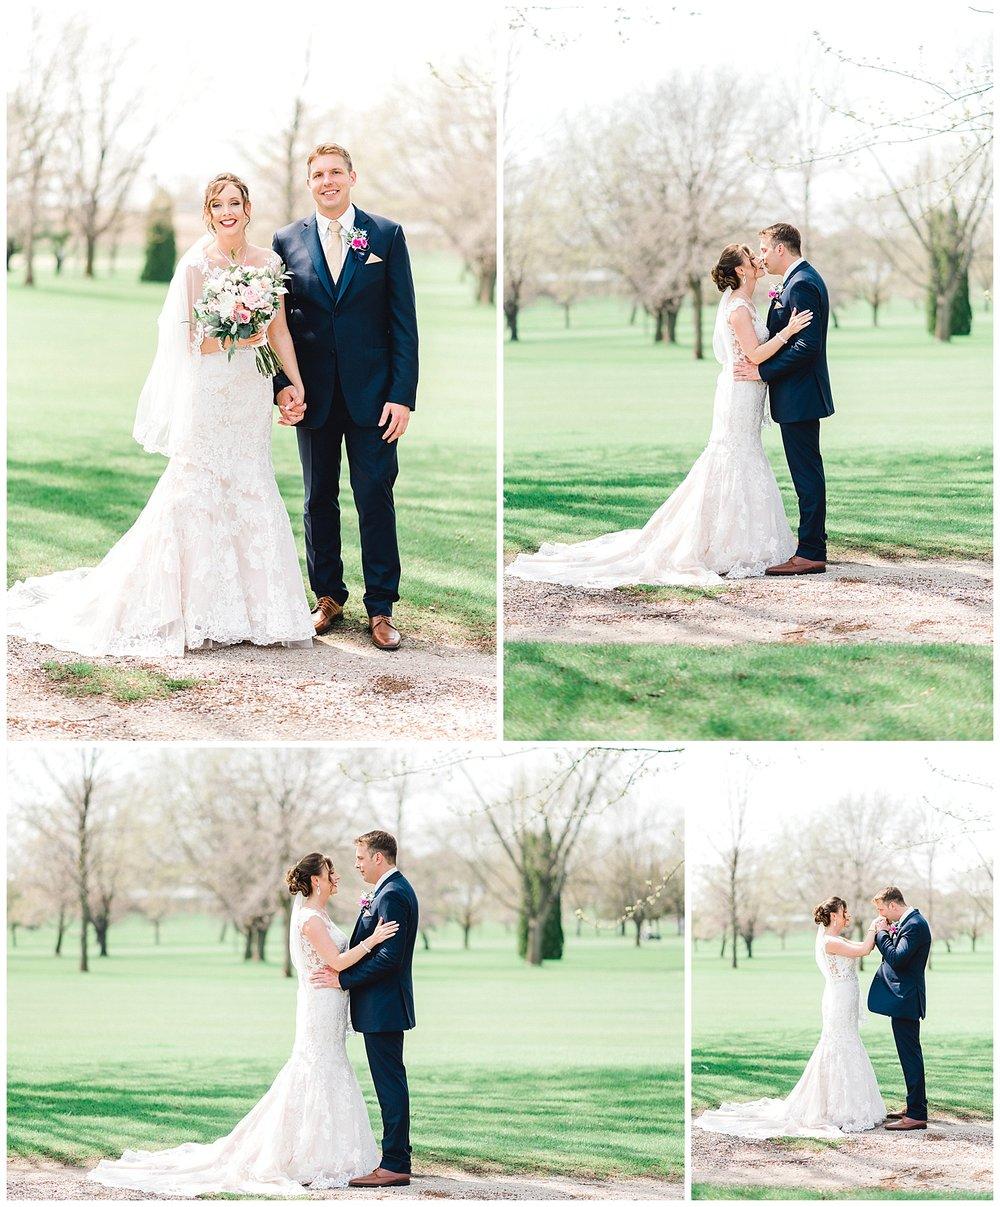 Bride and Groom Outdoor Weddding Nicole Corrine.jpg